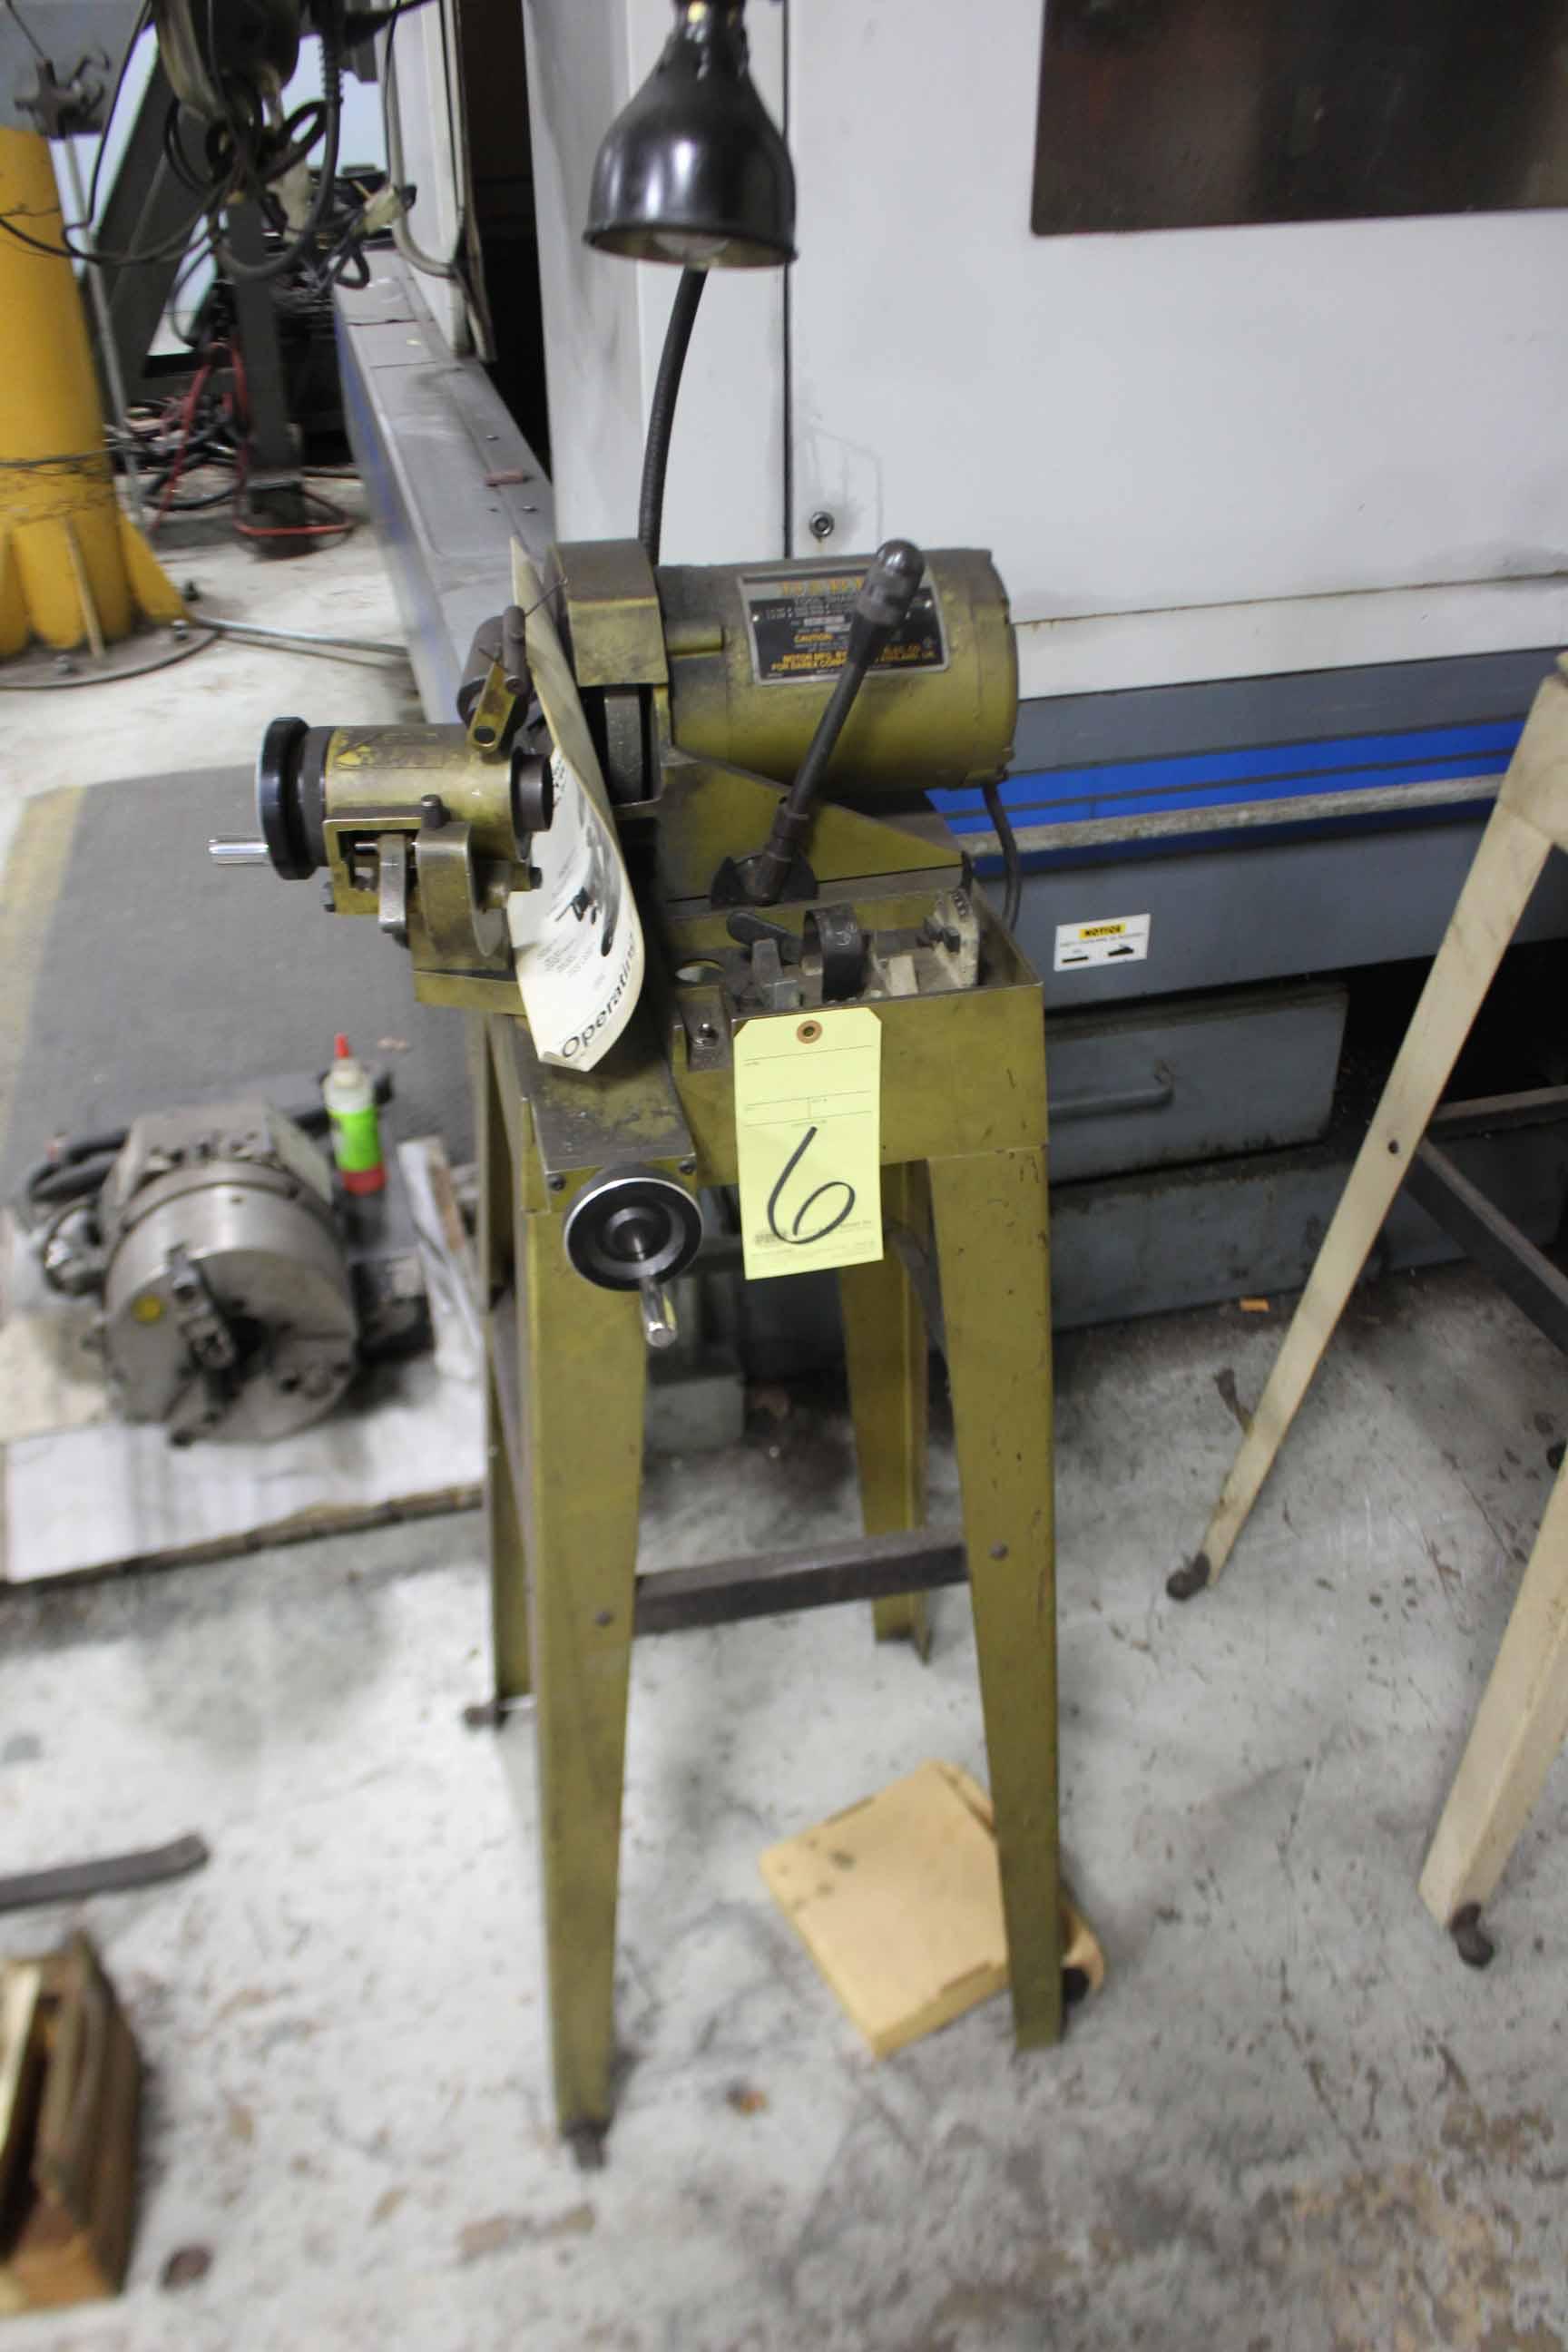 Lot 6 - DRILL SHARPENER, DAREX, 1/4 HP motor, S/N 70549